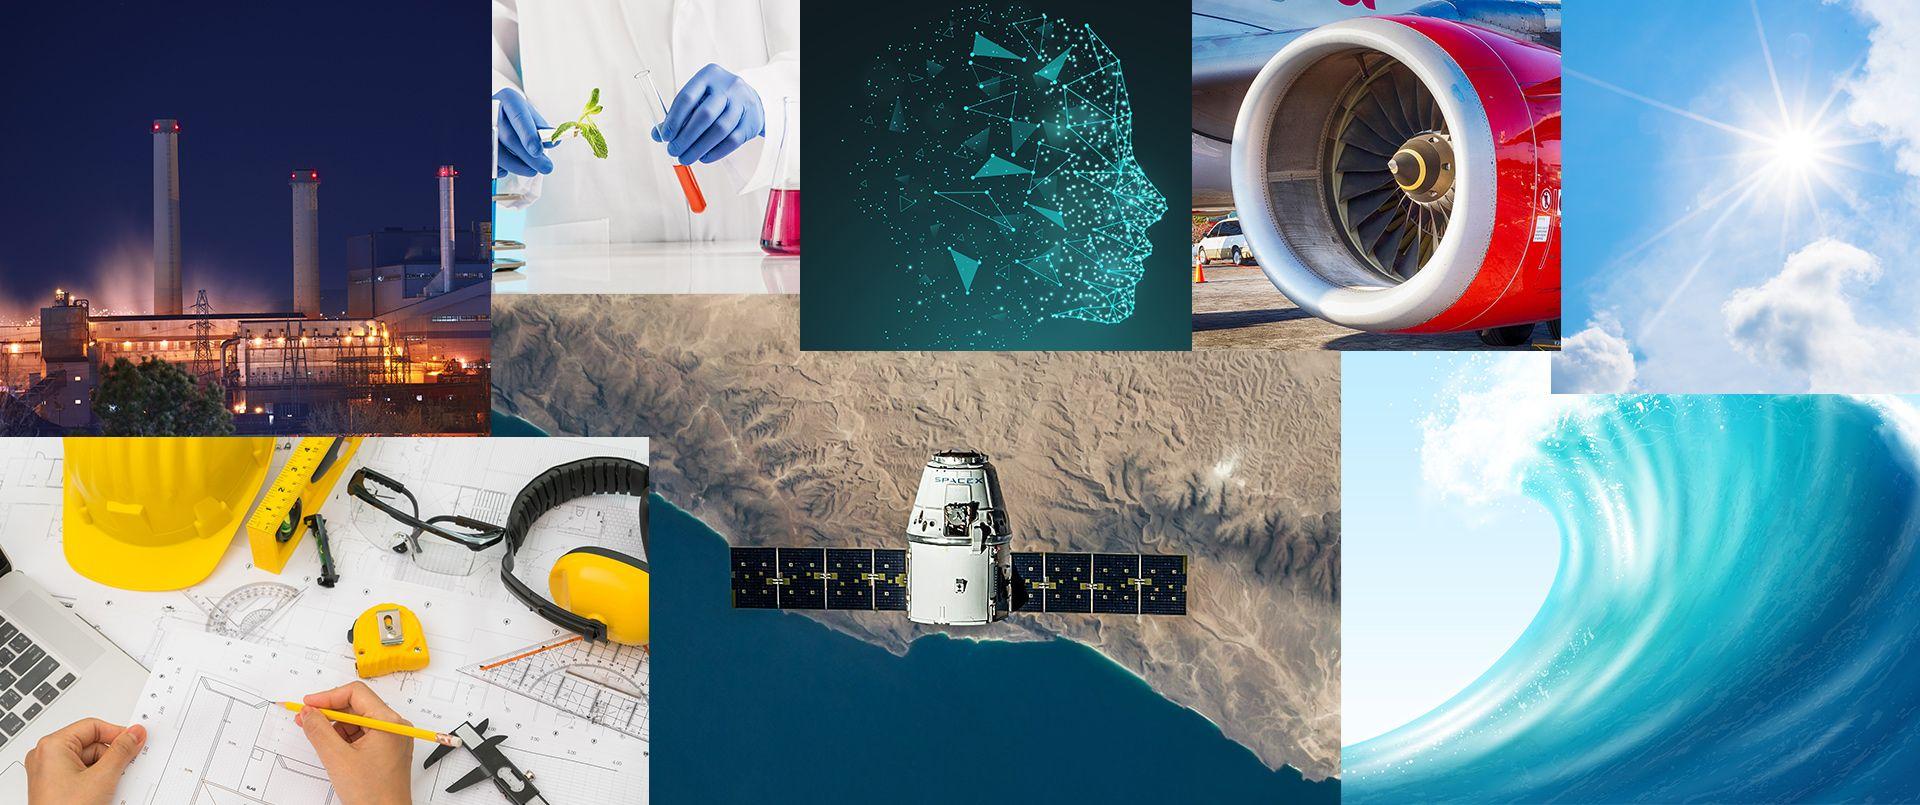 High performance computing (HPC) collage